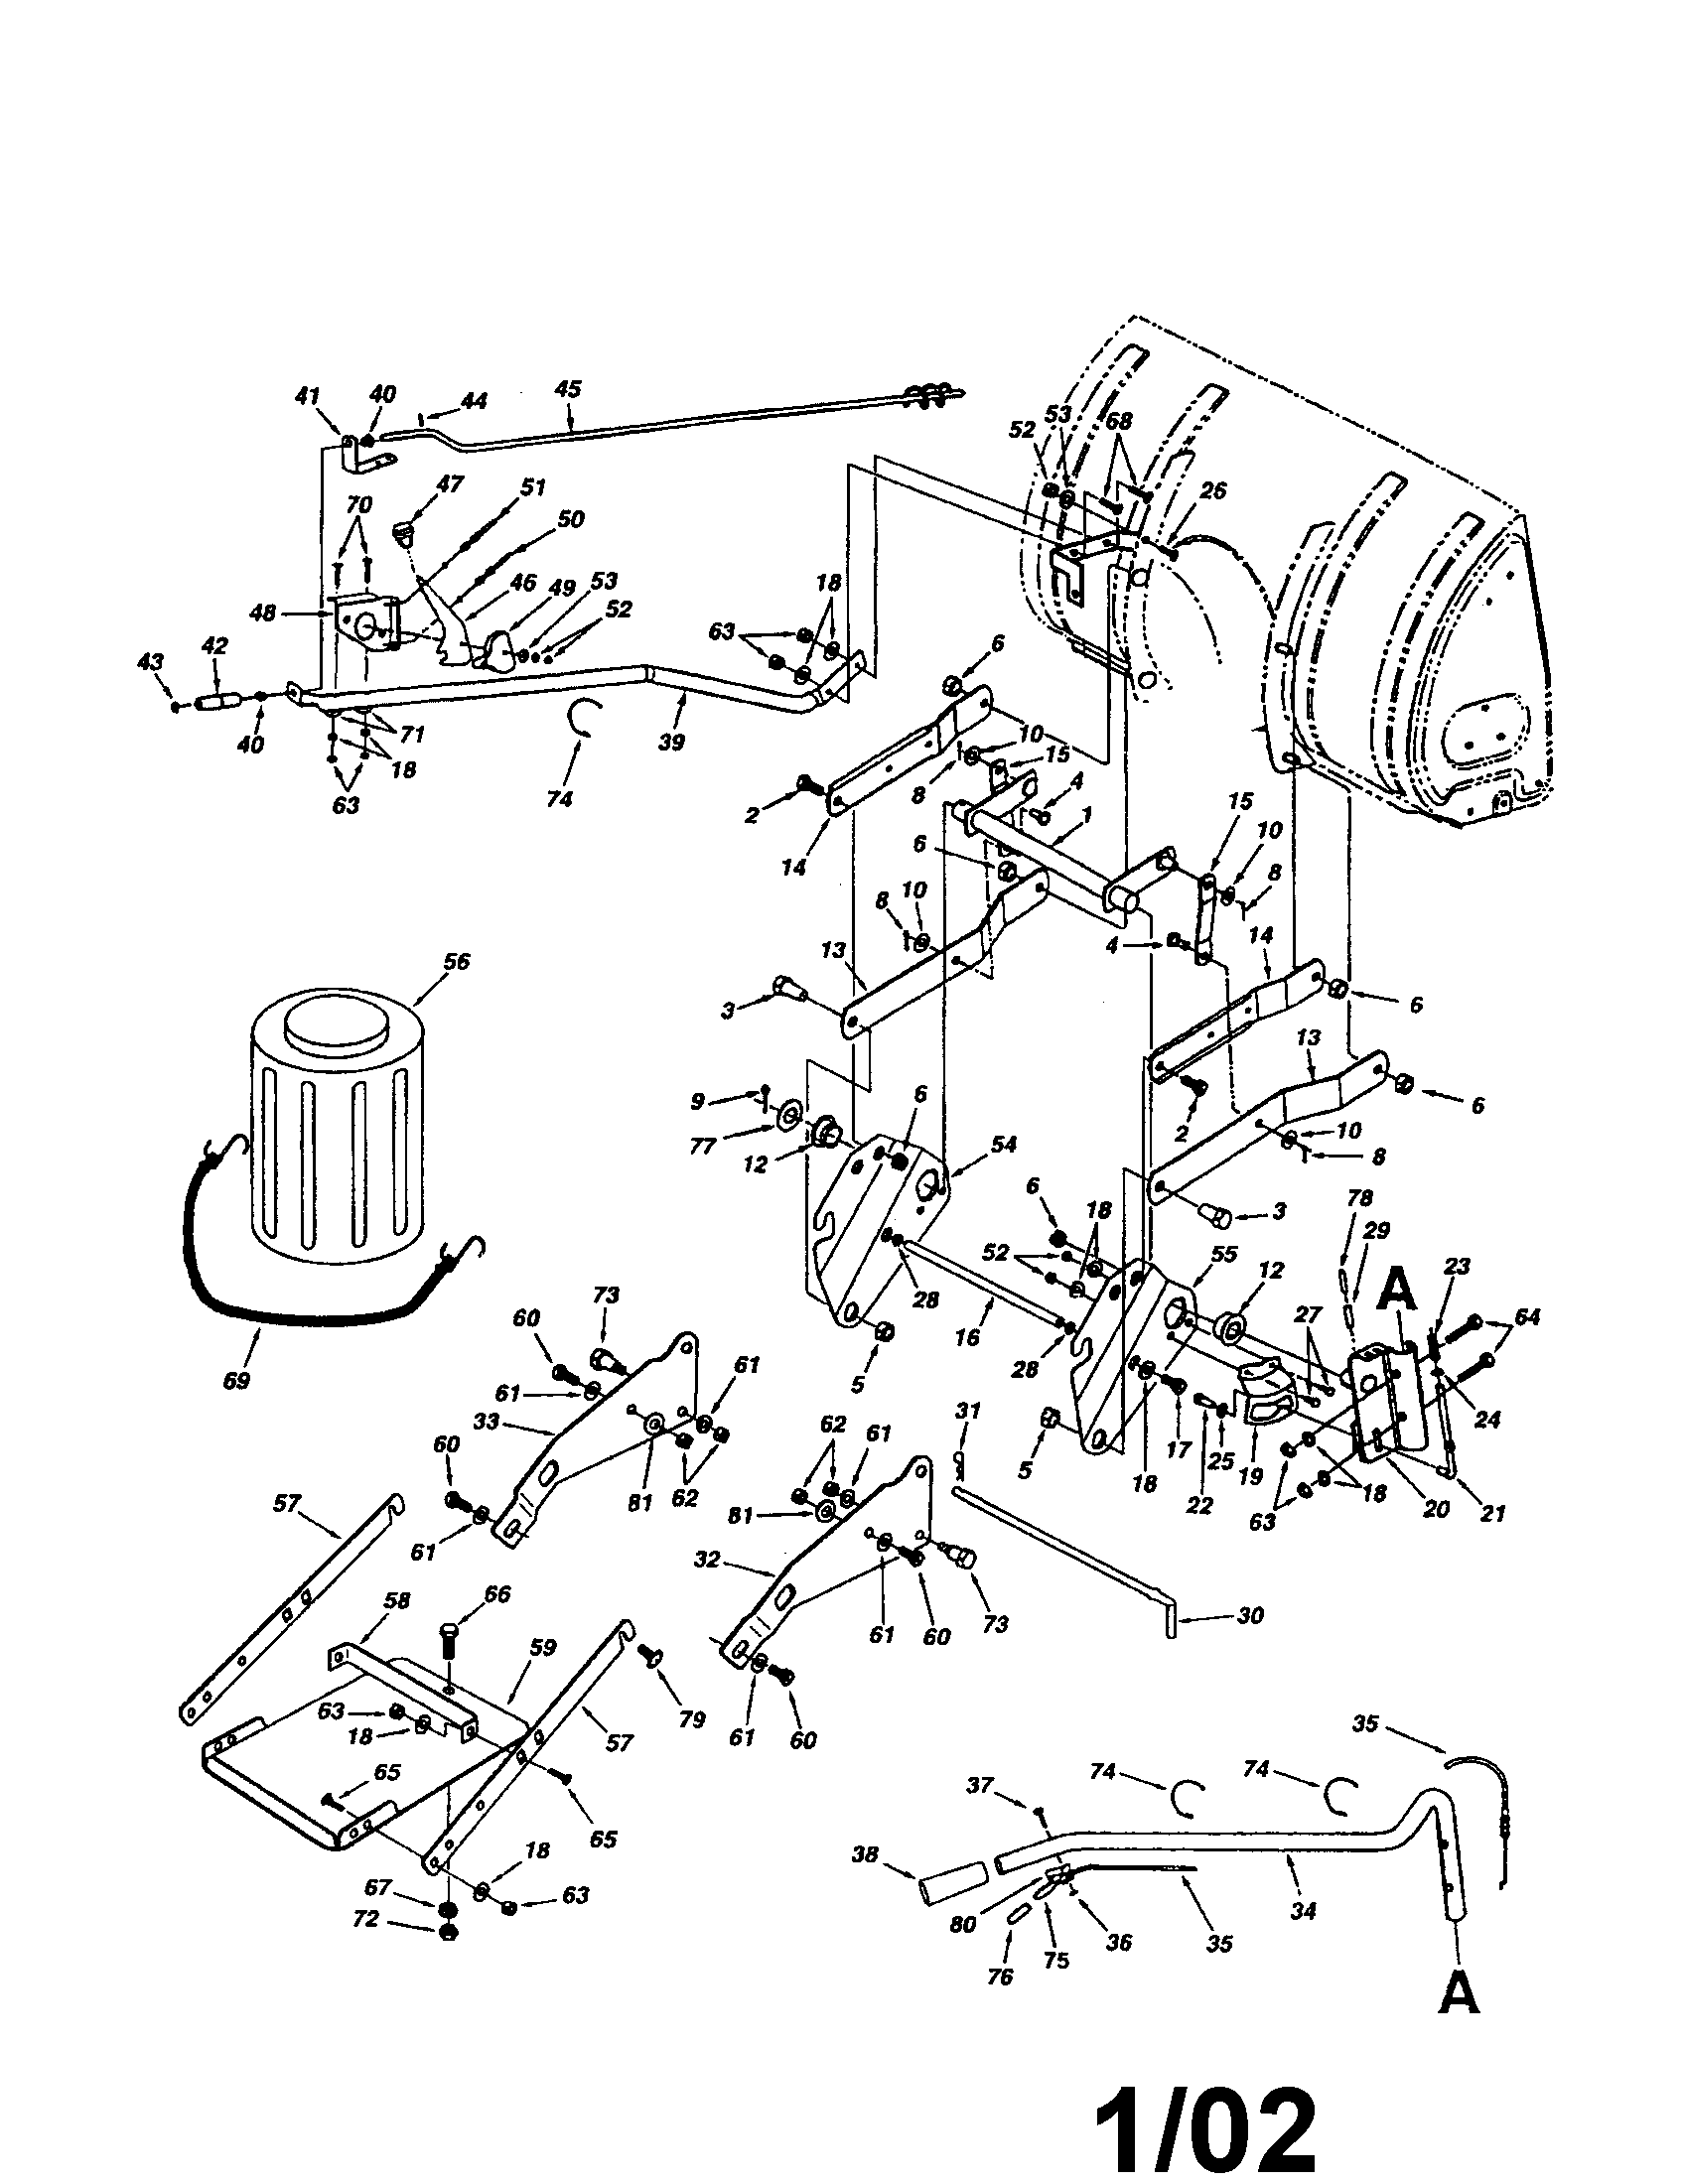 sears snow blower mocel c950-52671-8 manual